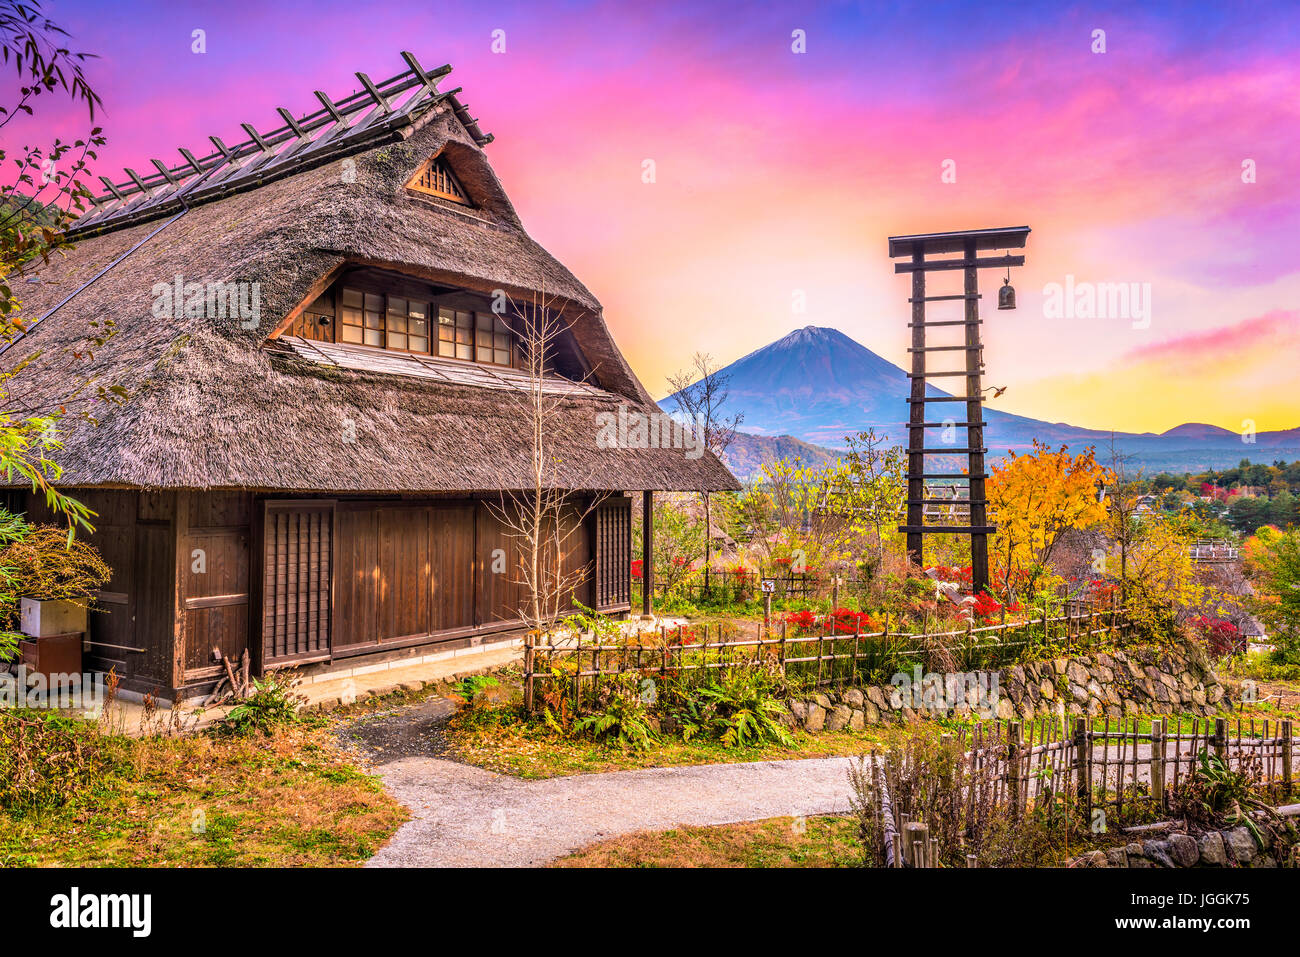 Mt. Fuji, Japan with historic village Iyashi no Sato during autumn - Stock Image